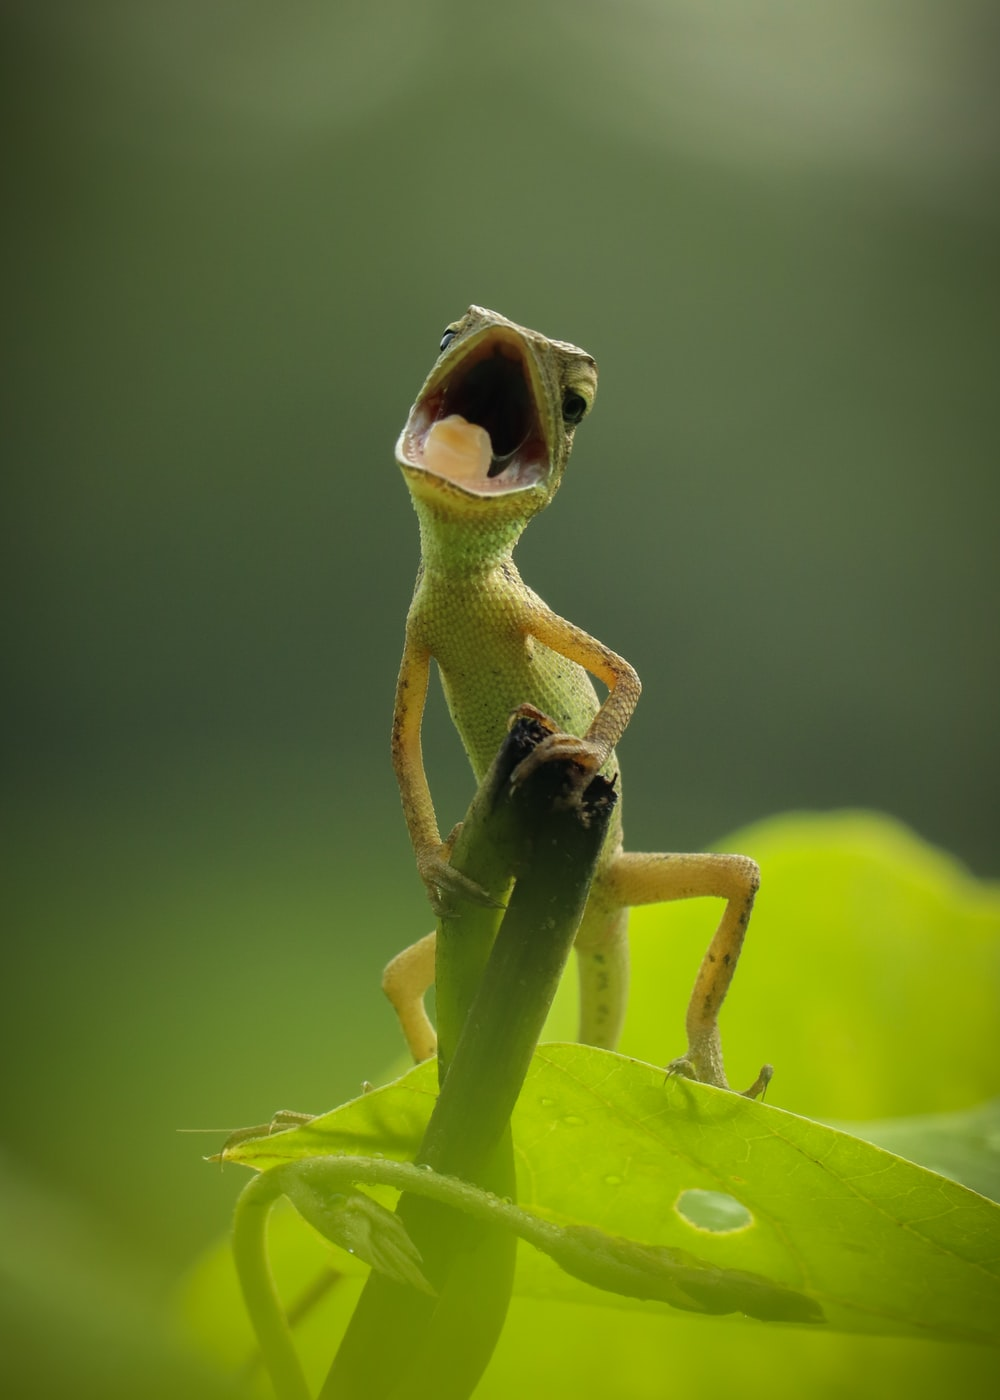 green frog on green leaf